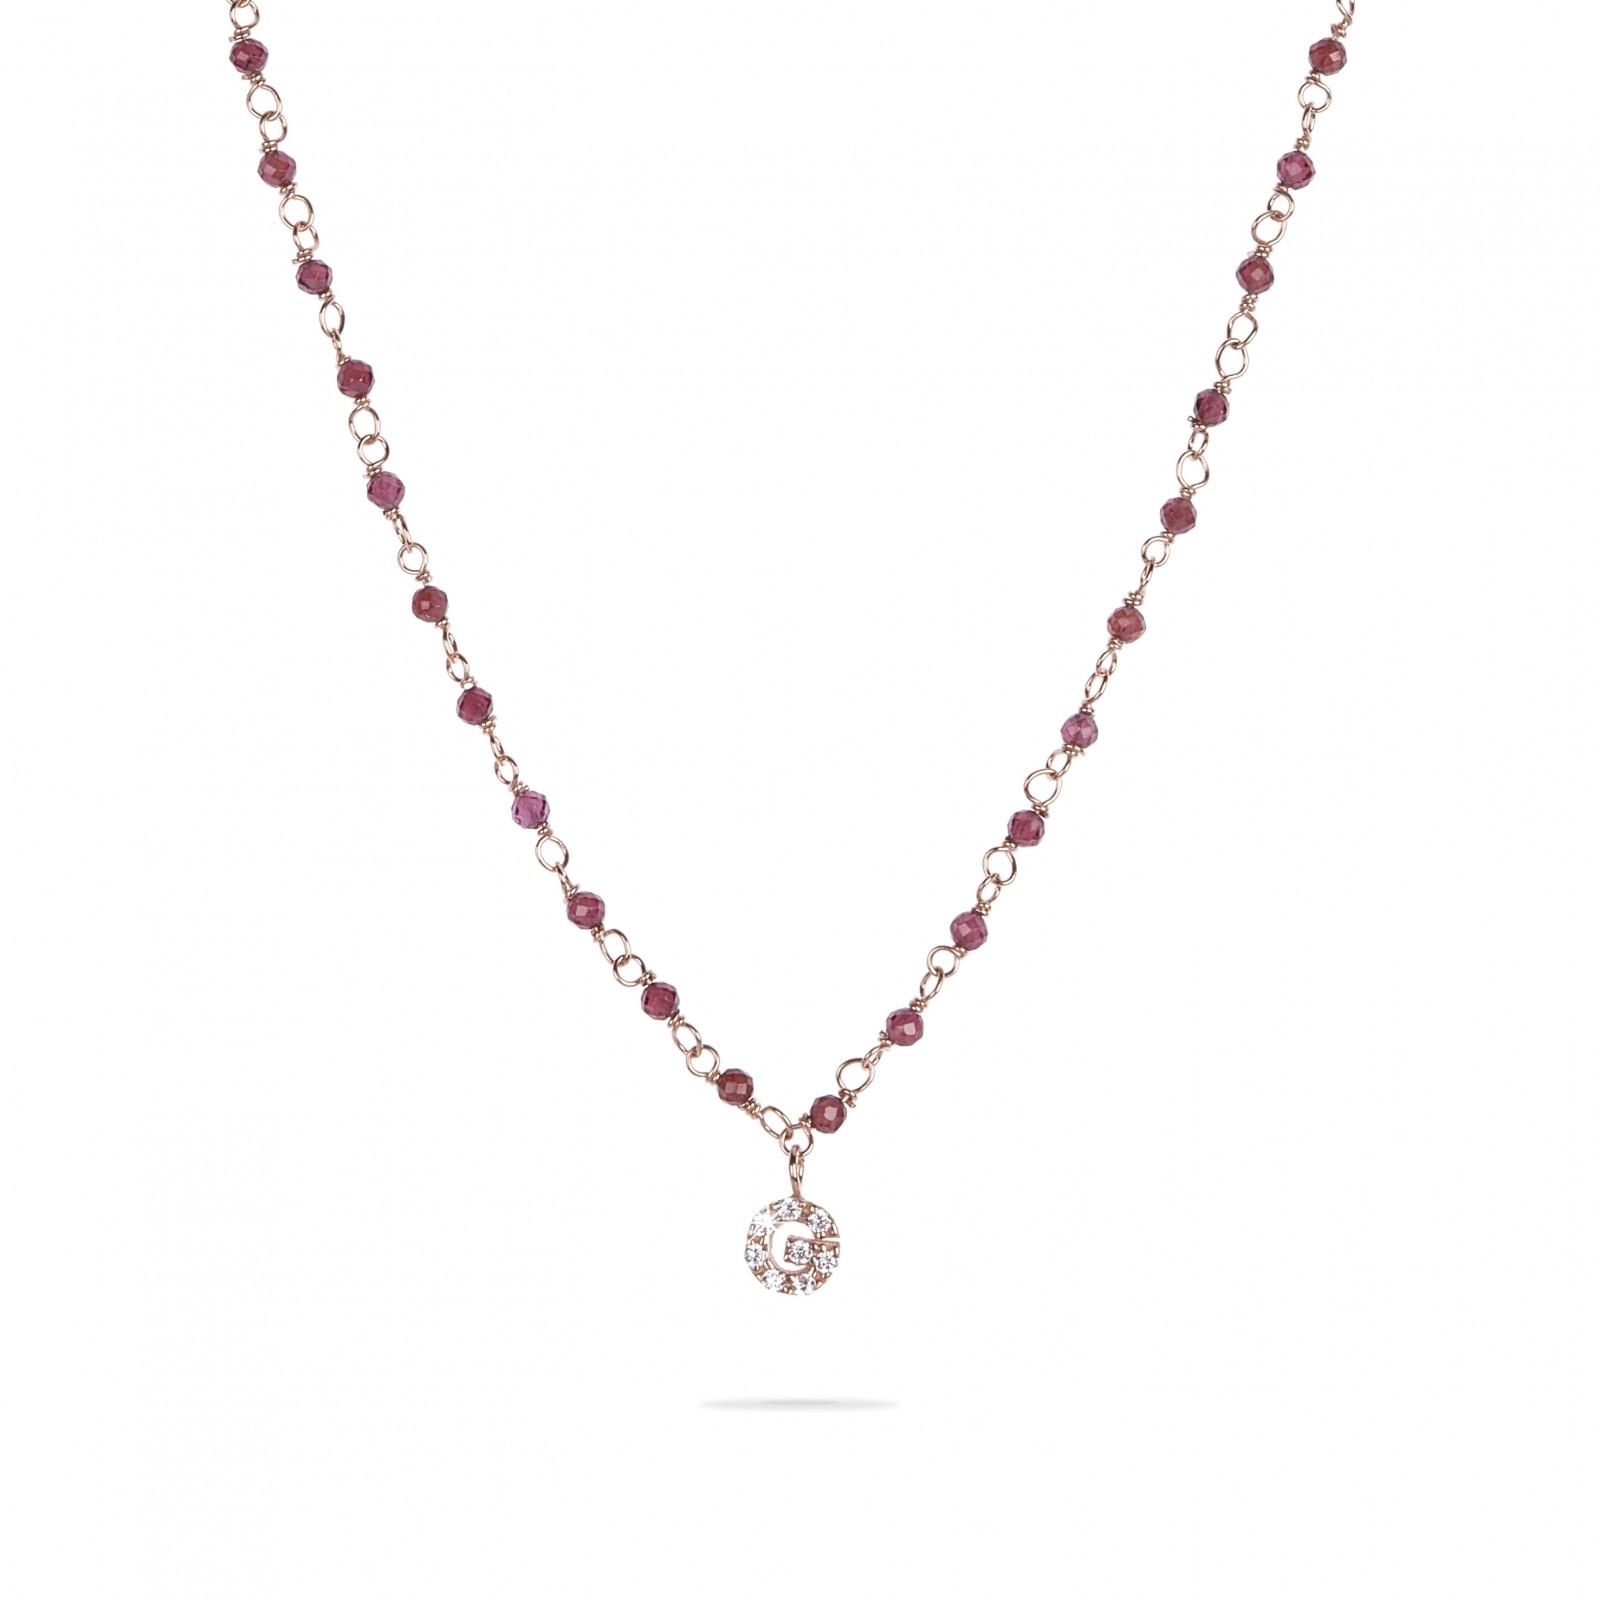 l'atteggiamento migliore cb4fc 044df Necklace with natural stones and initial small pave '